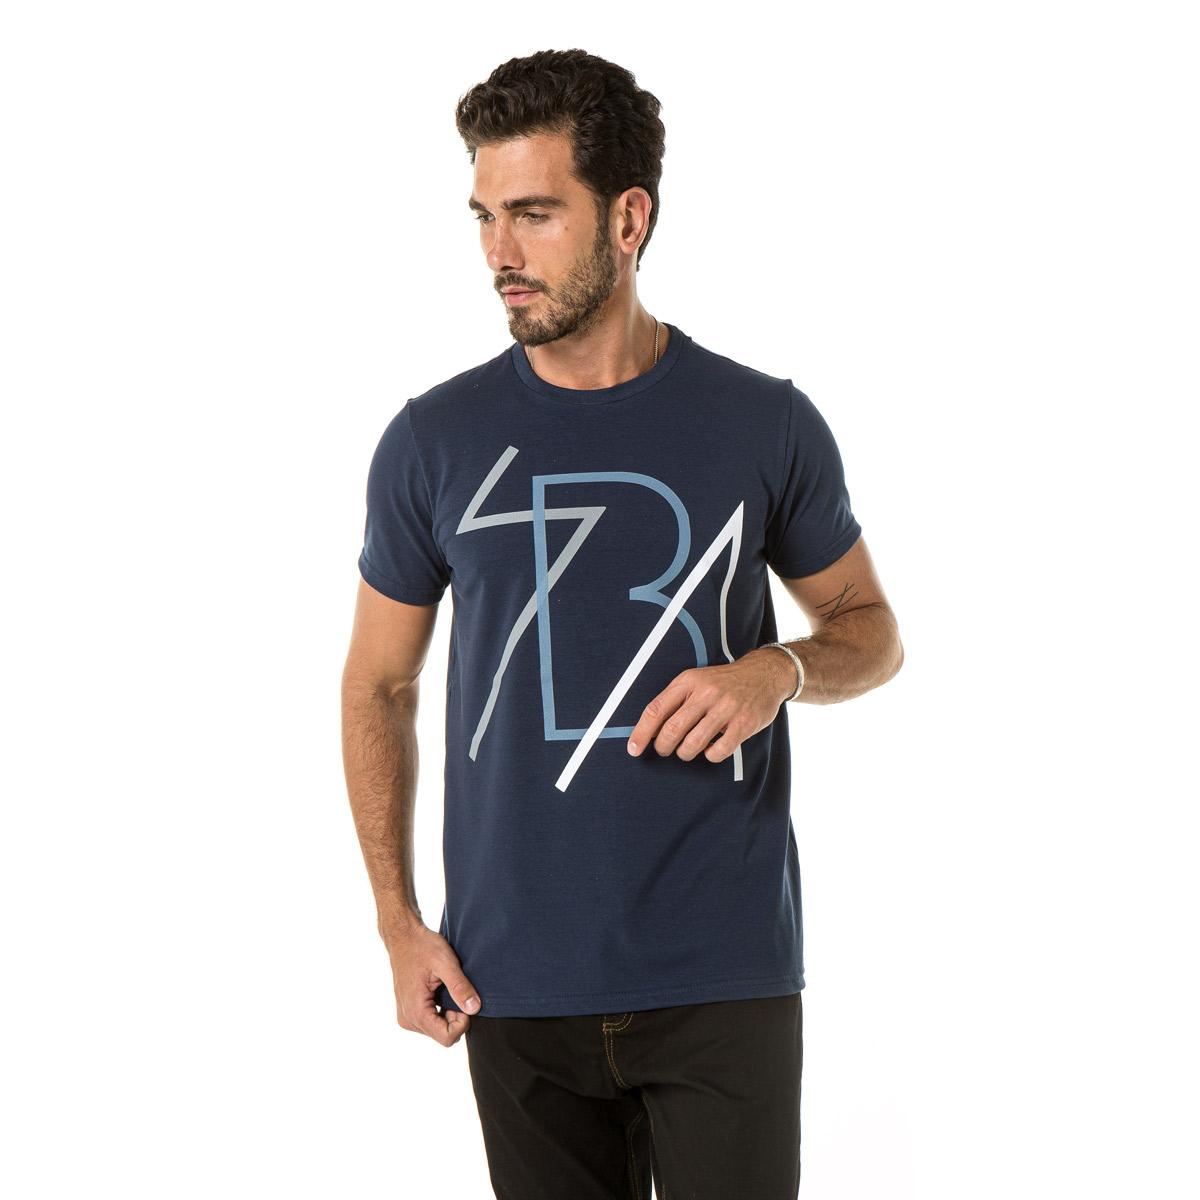 Camiseta Masculina Sba  20394